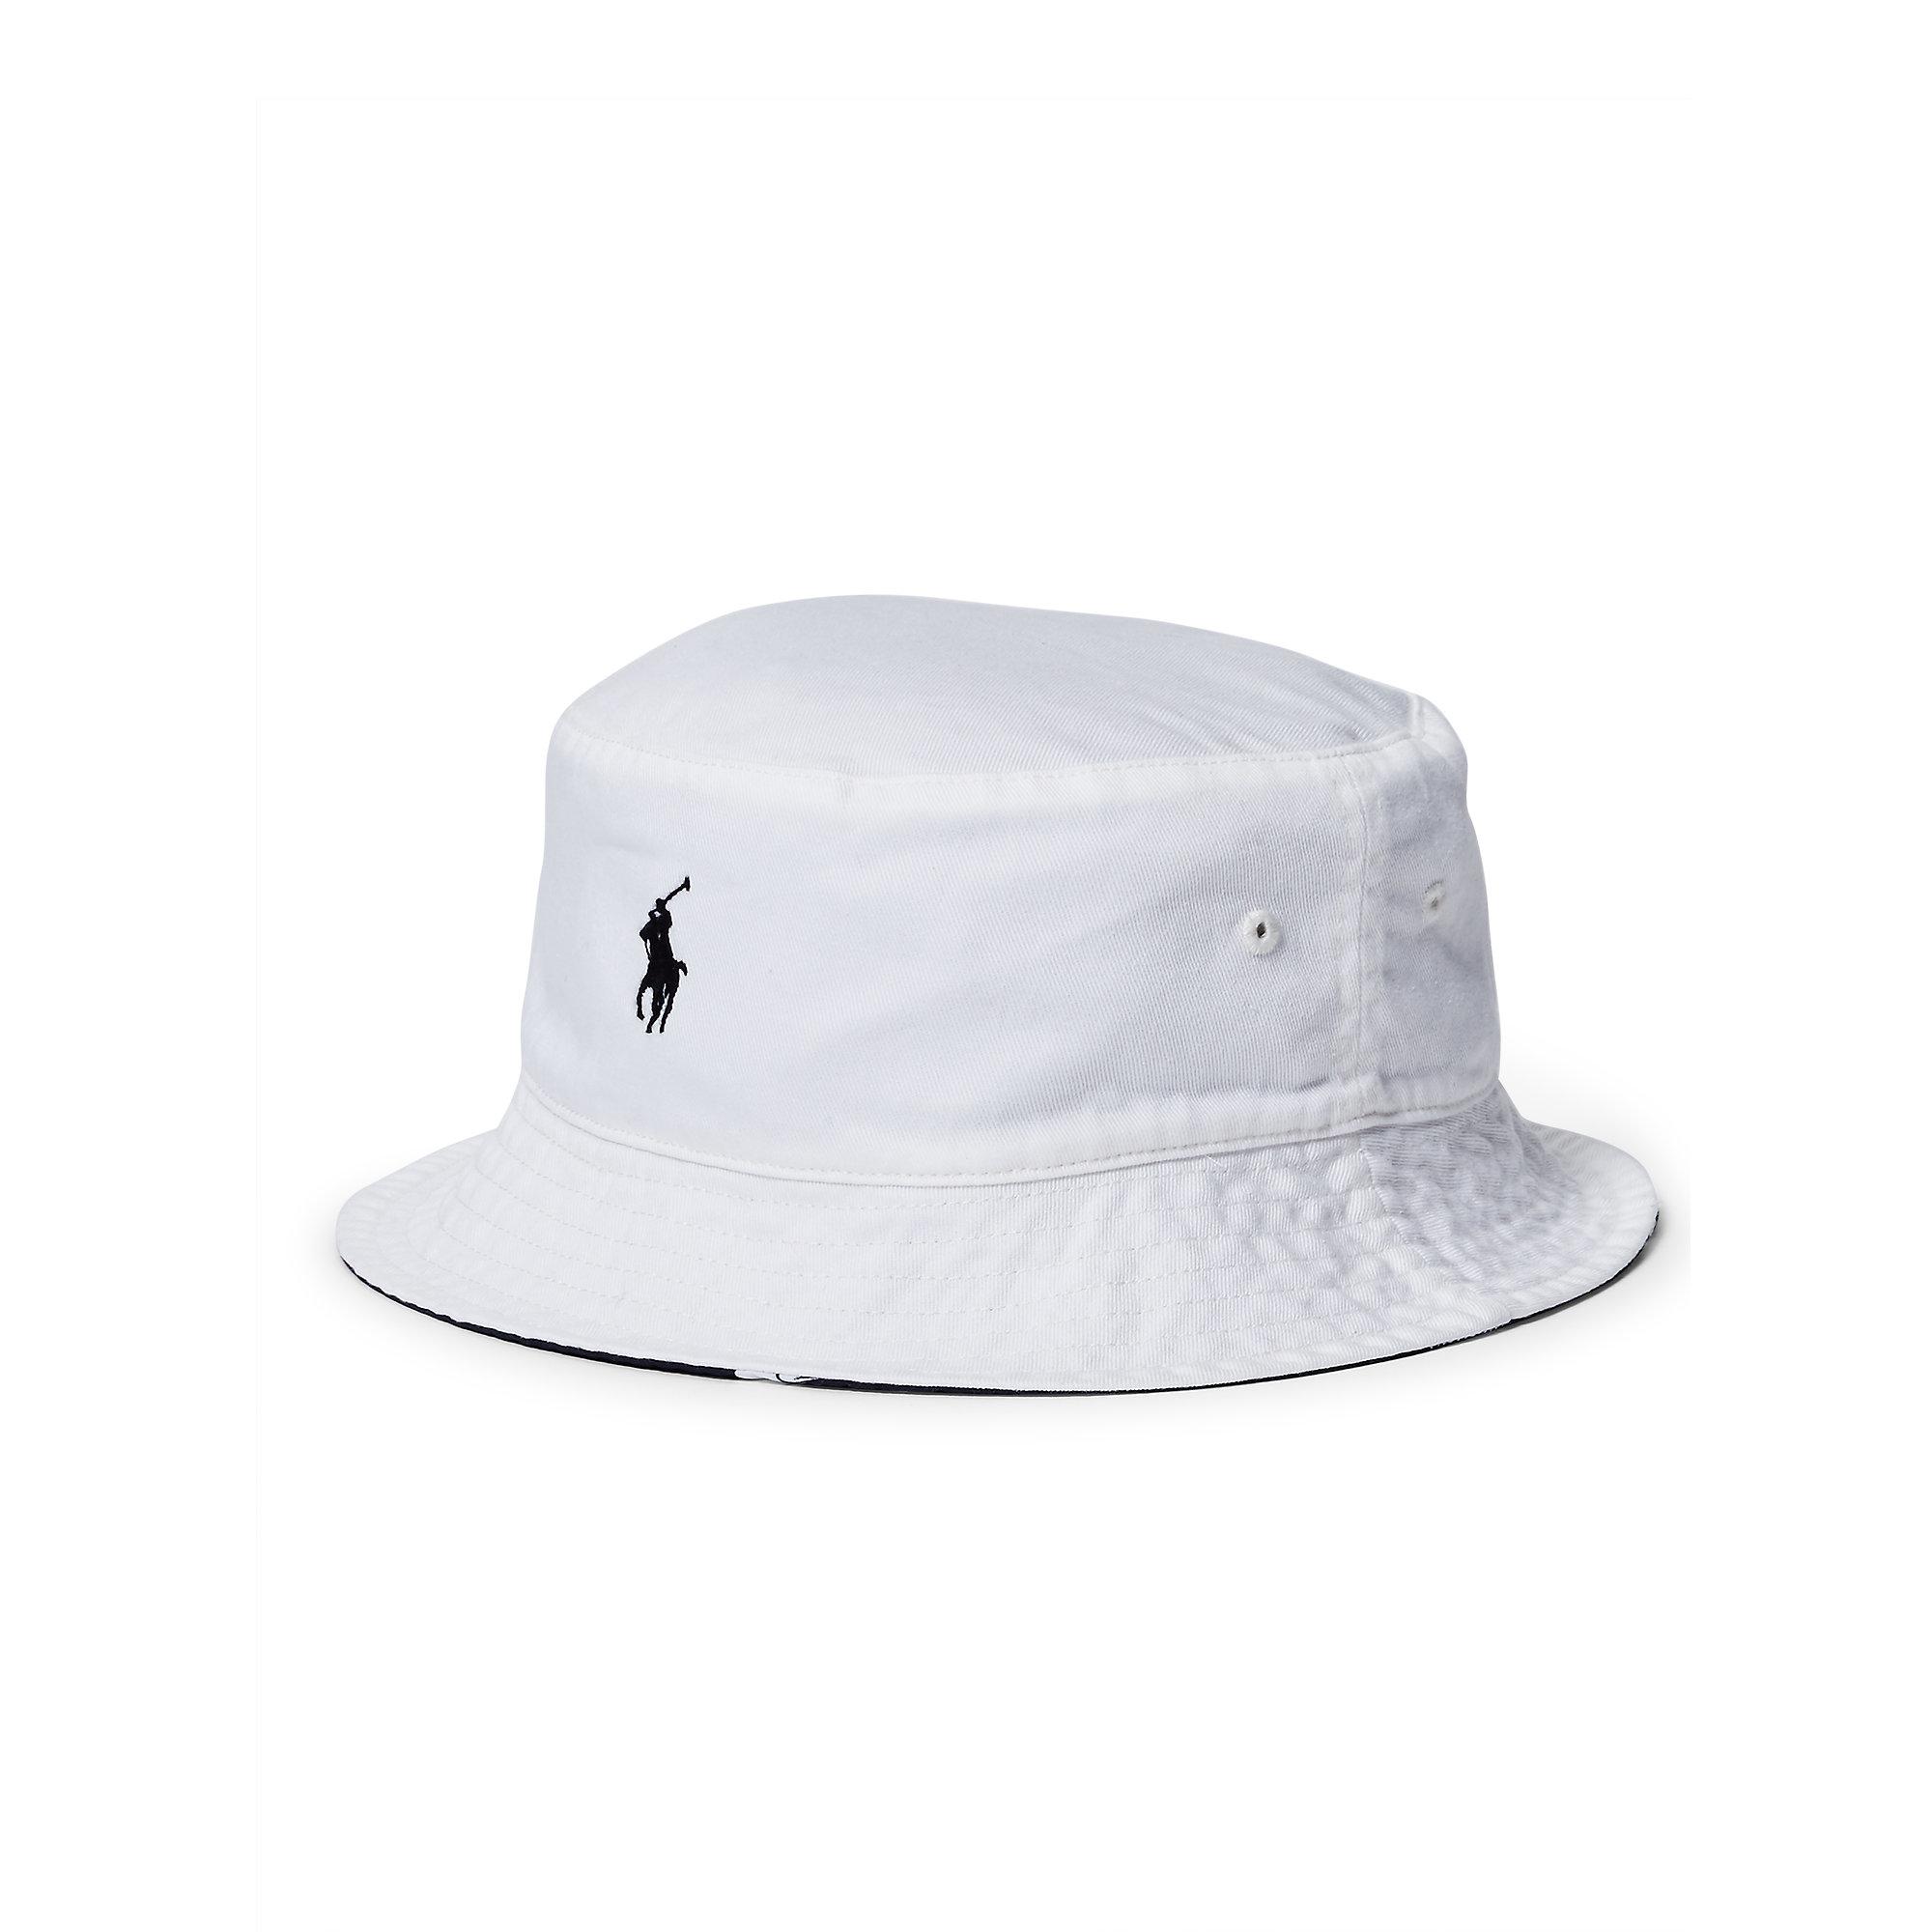 Lyst - Polo Ralph Lauren Reversible Twill Bucket Hat in White for Men 06e464f77b3